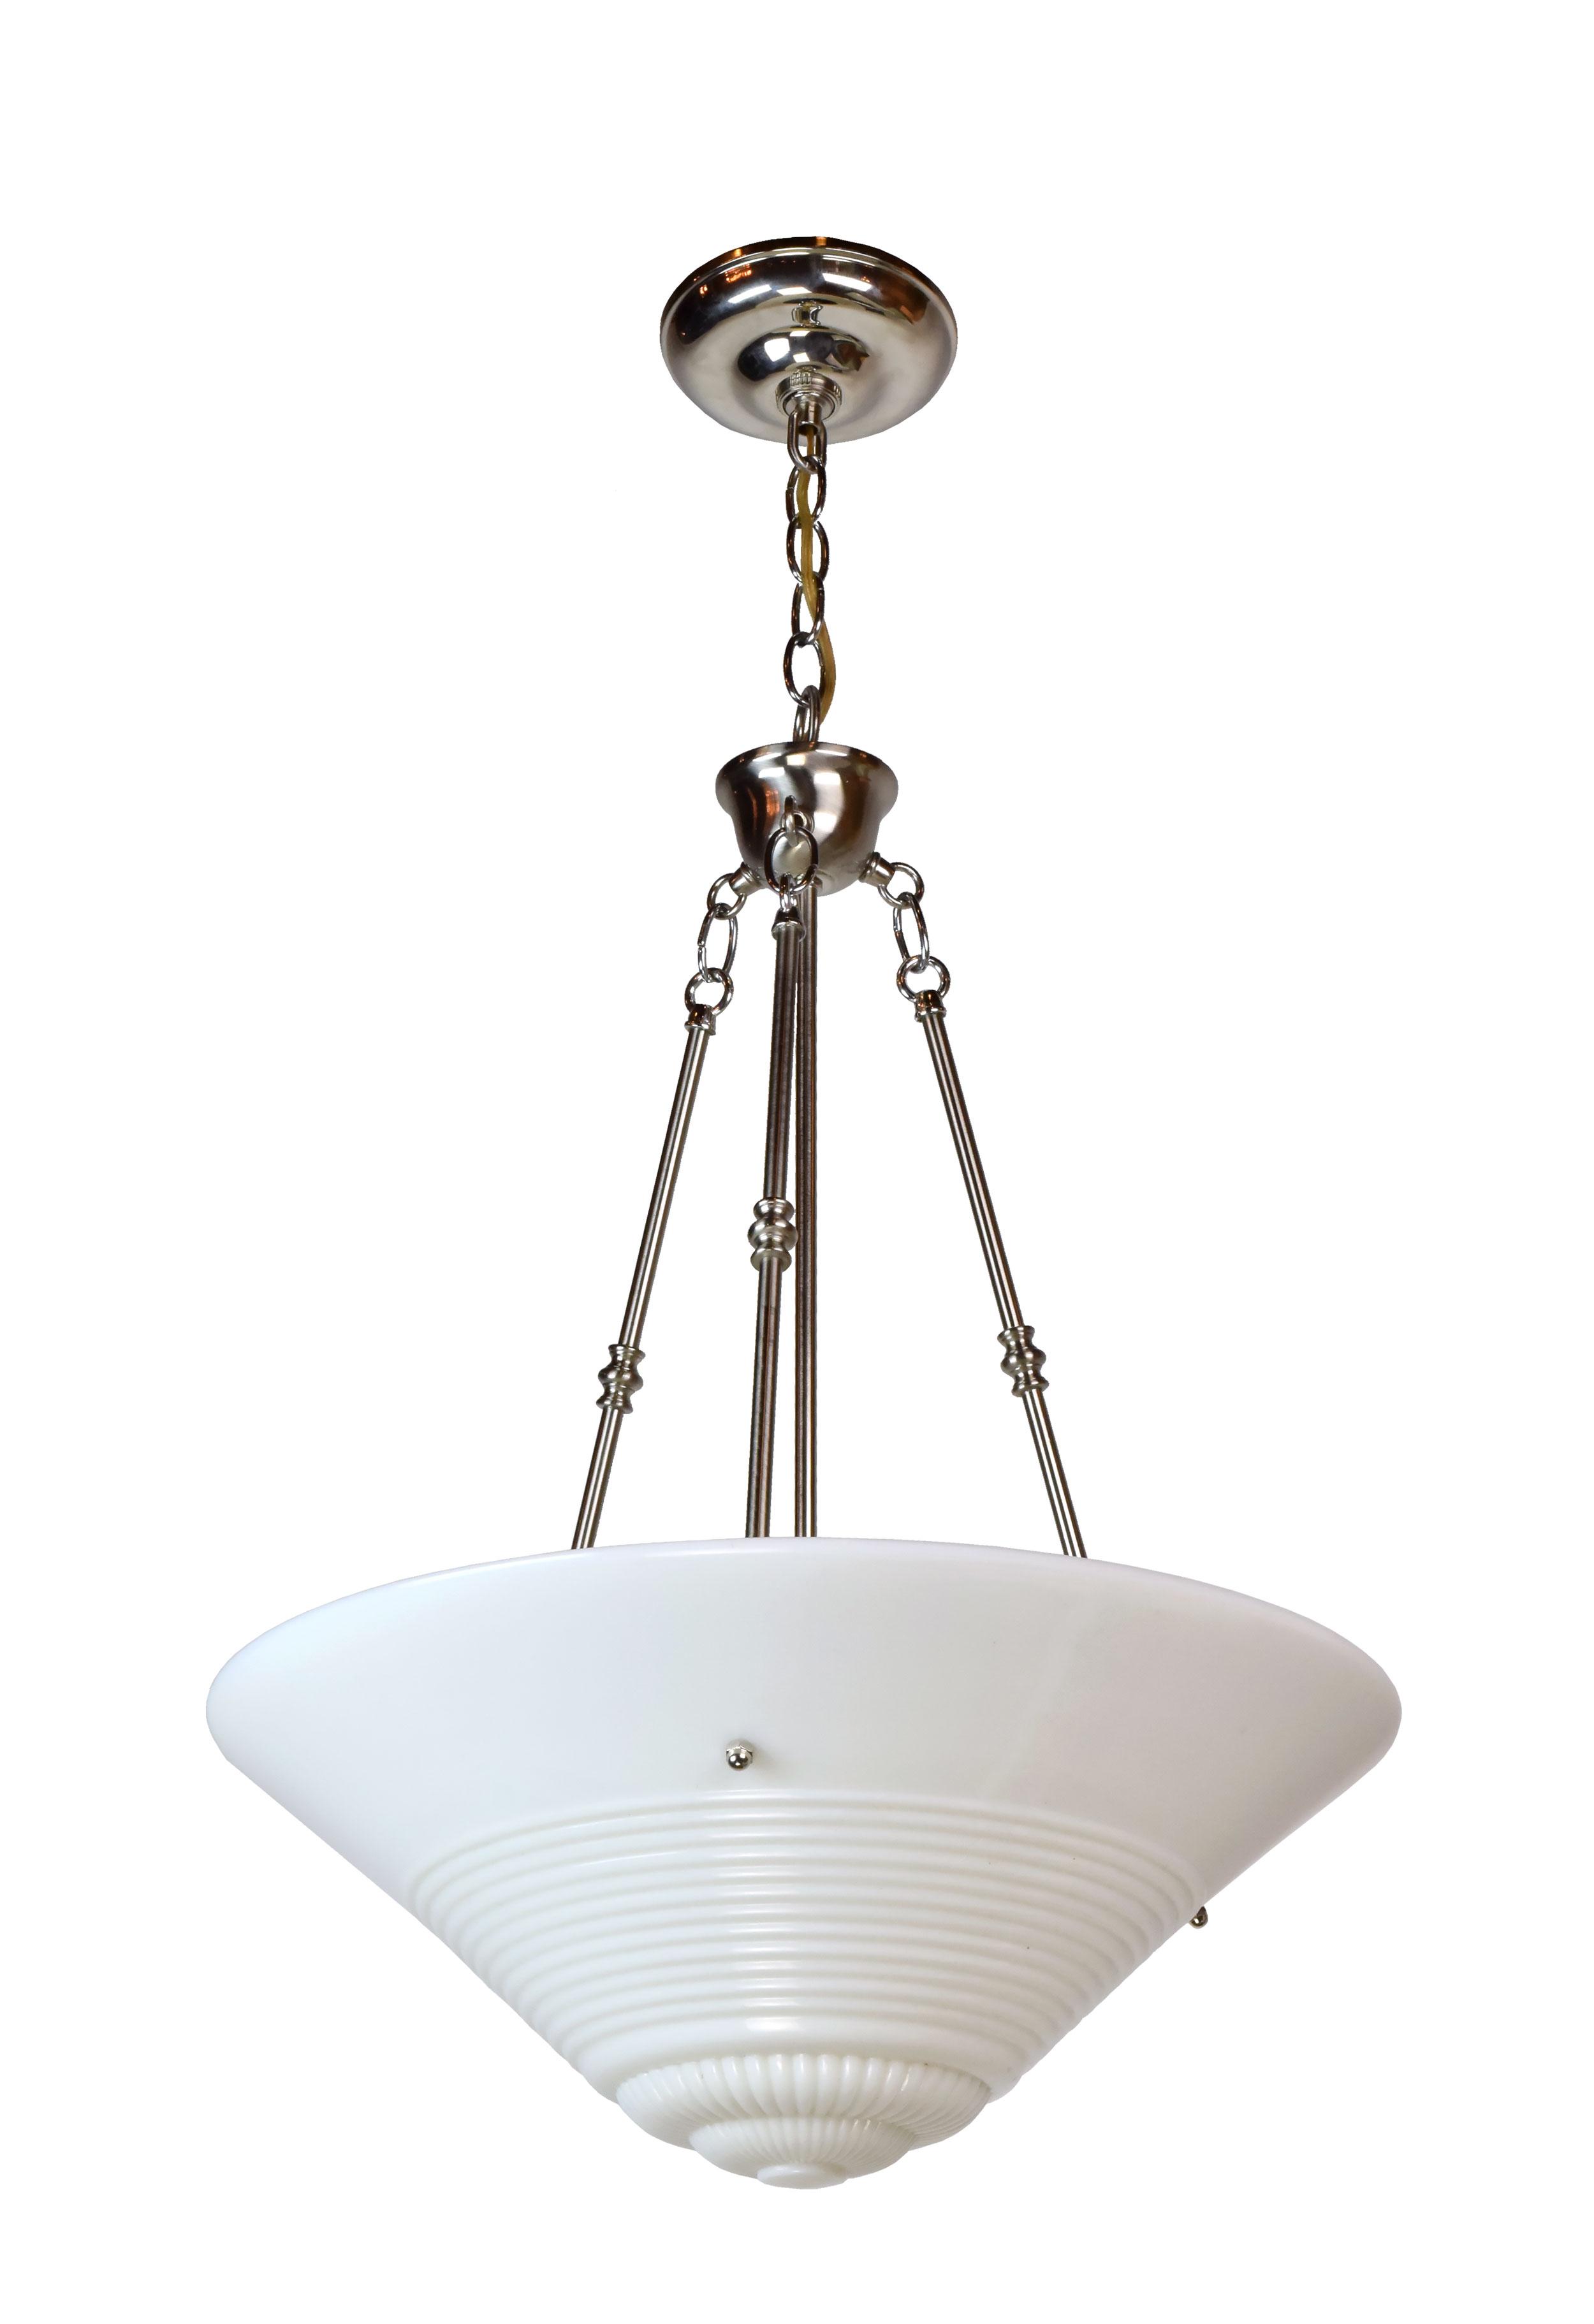 47188-art-deco-bowl-pendant-angled-view.jpg